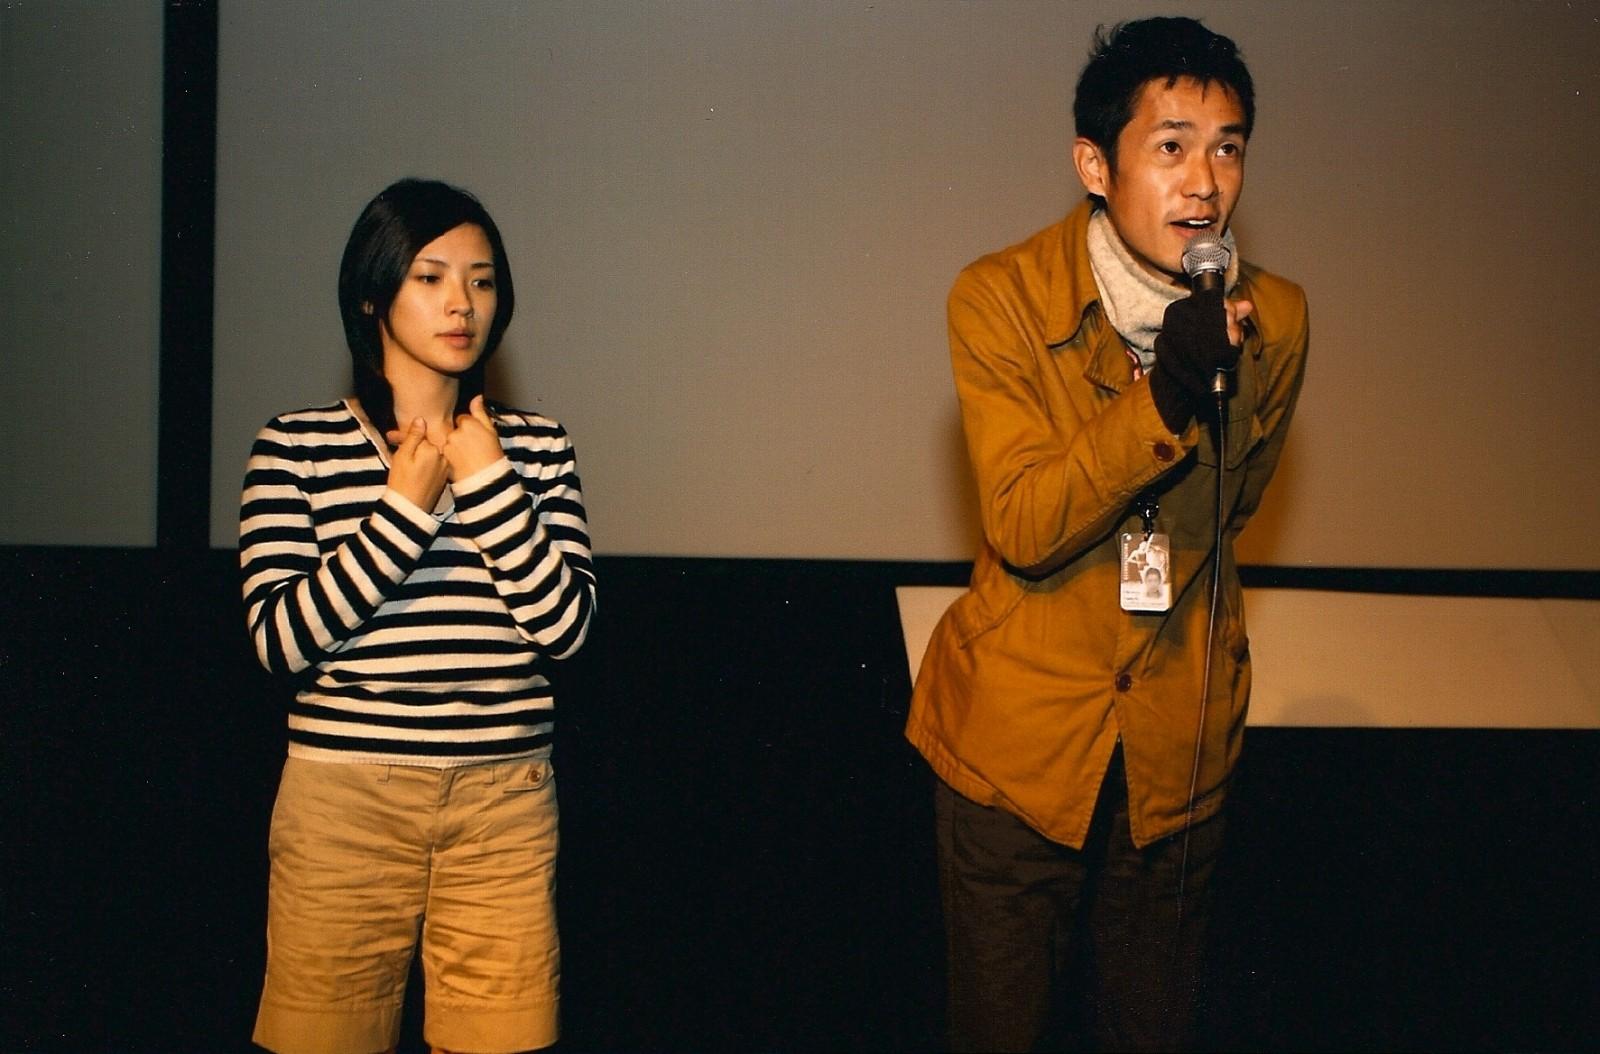 Mari Hoshino, Tomoyuki Furumaya